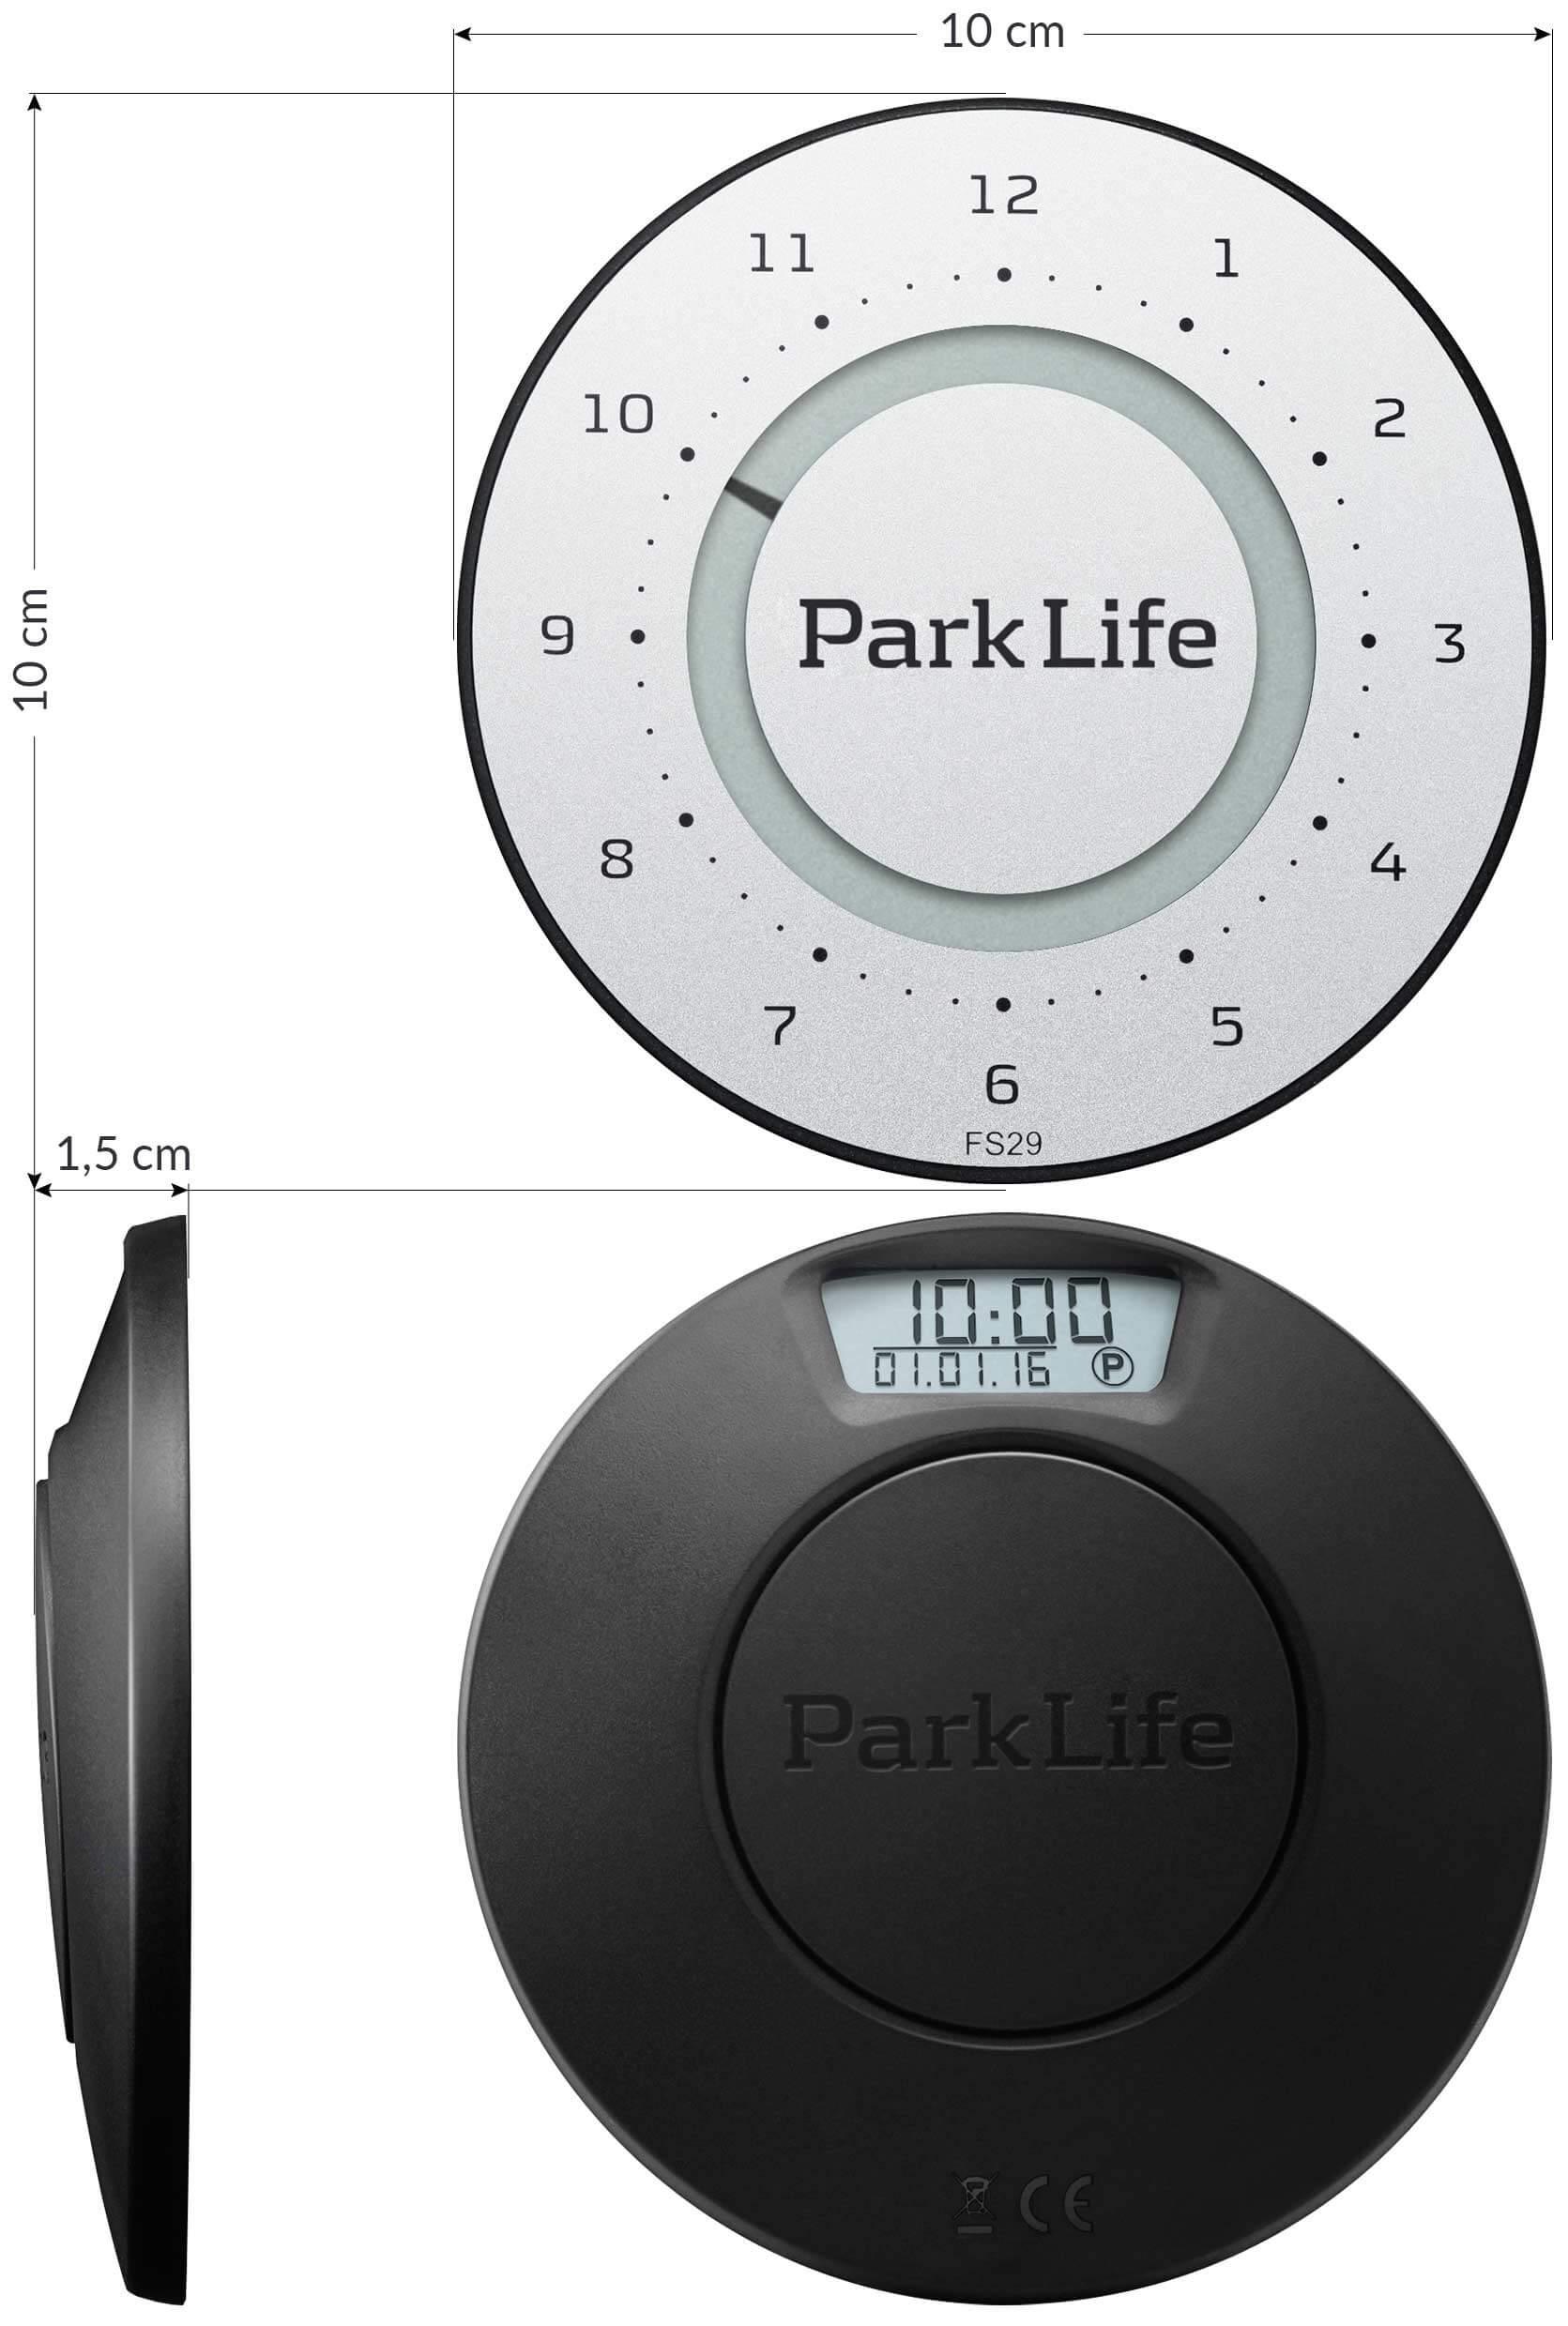 Park Life dimensions